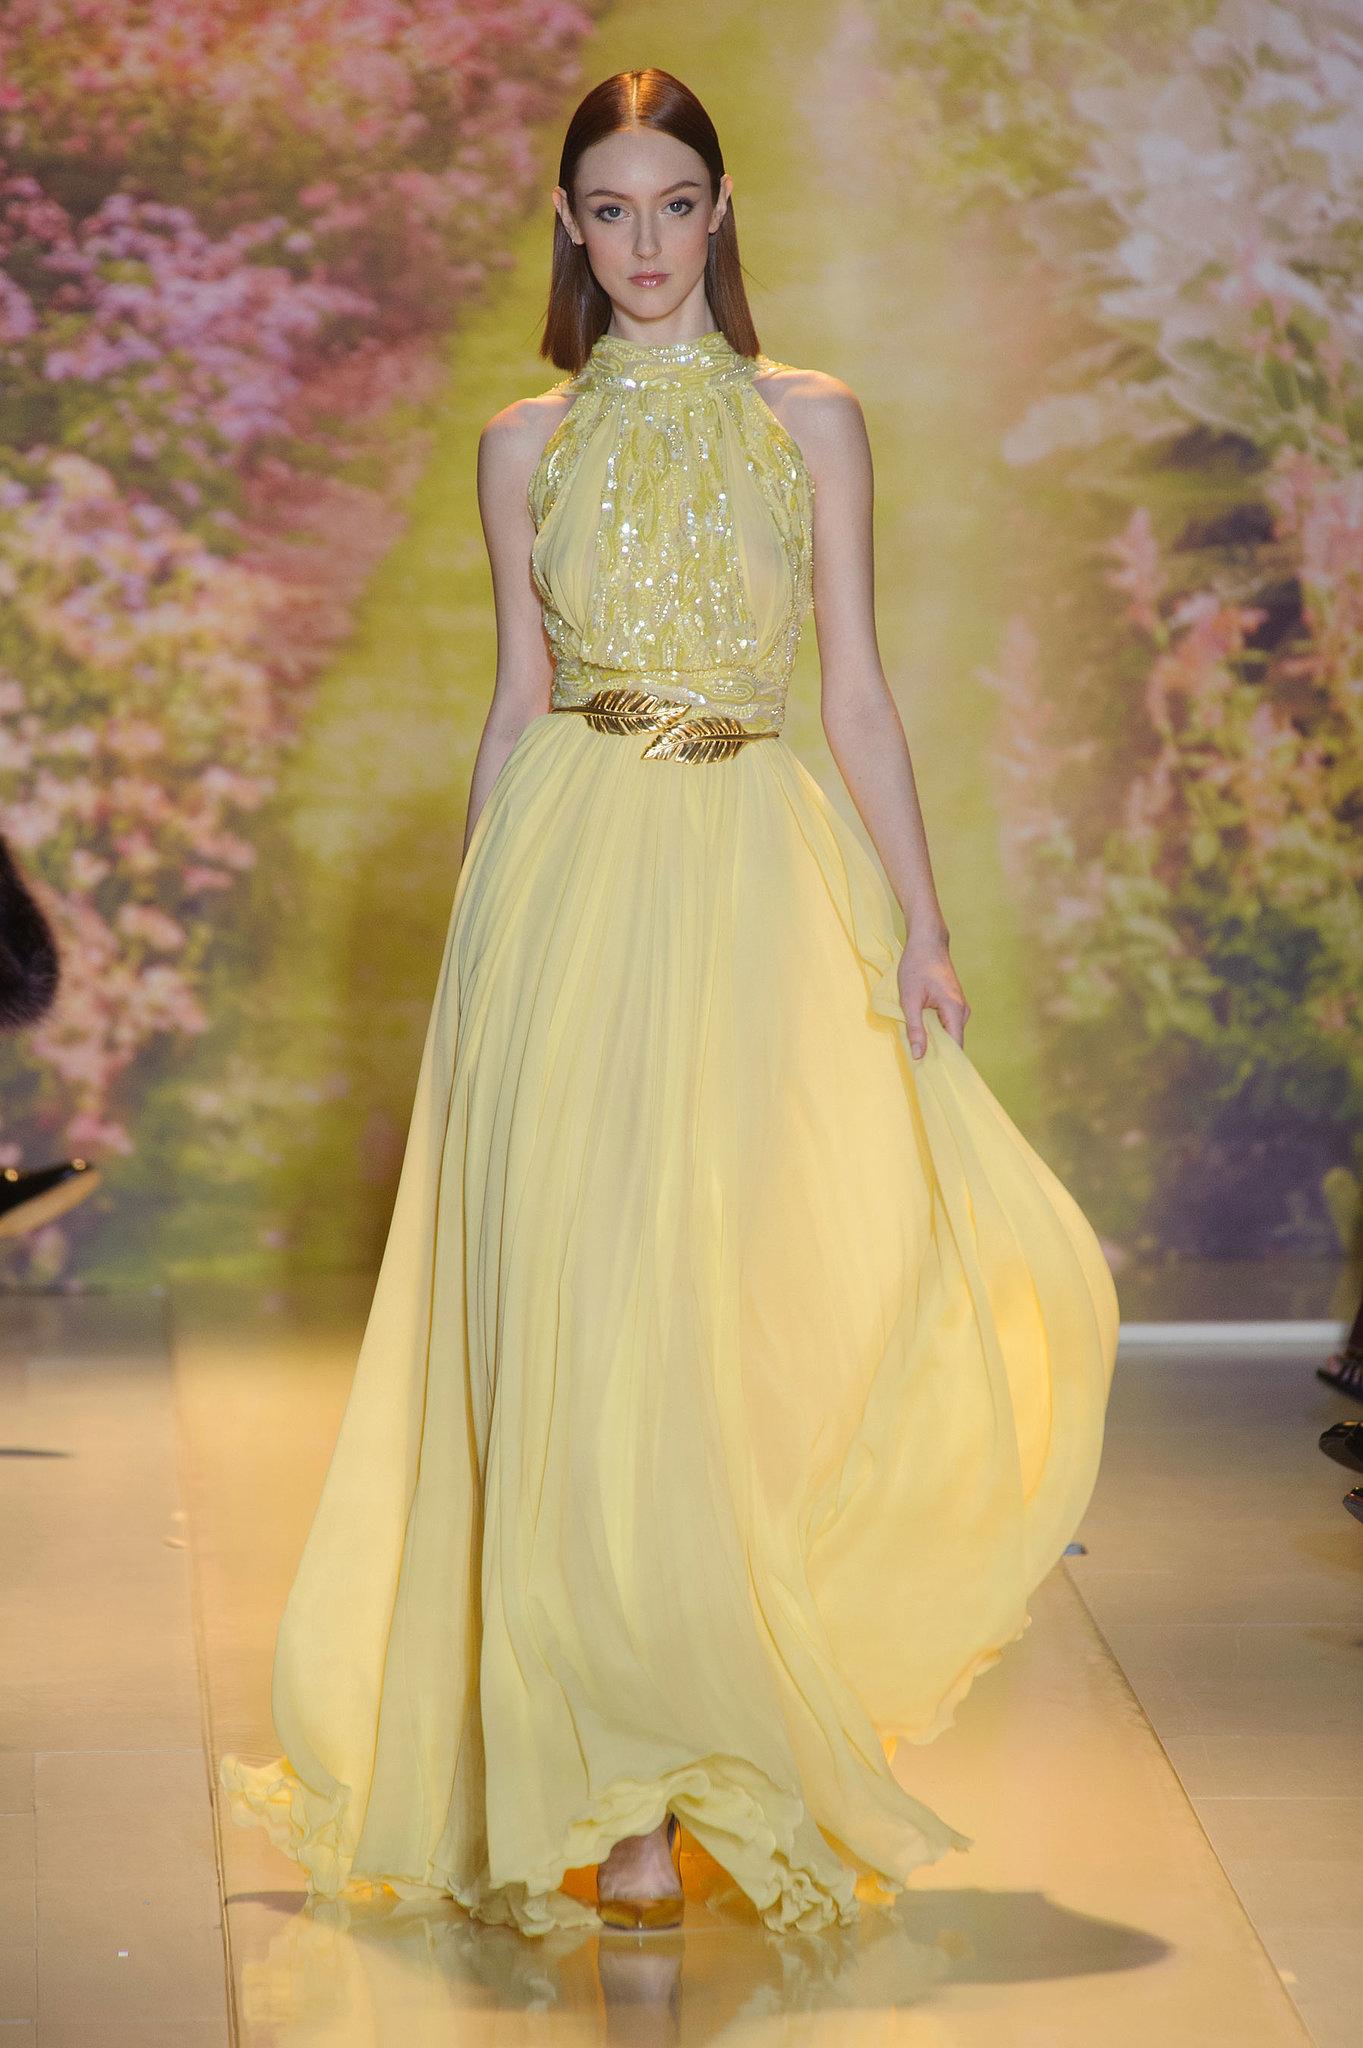 Zuhair Murad Haute Couture 2014Zuhair Murad Haute Couture 2014